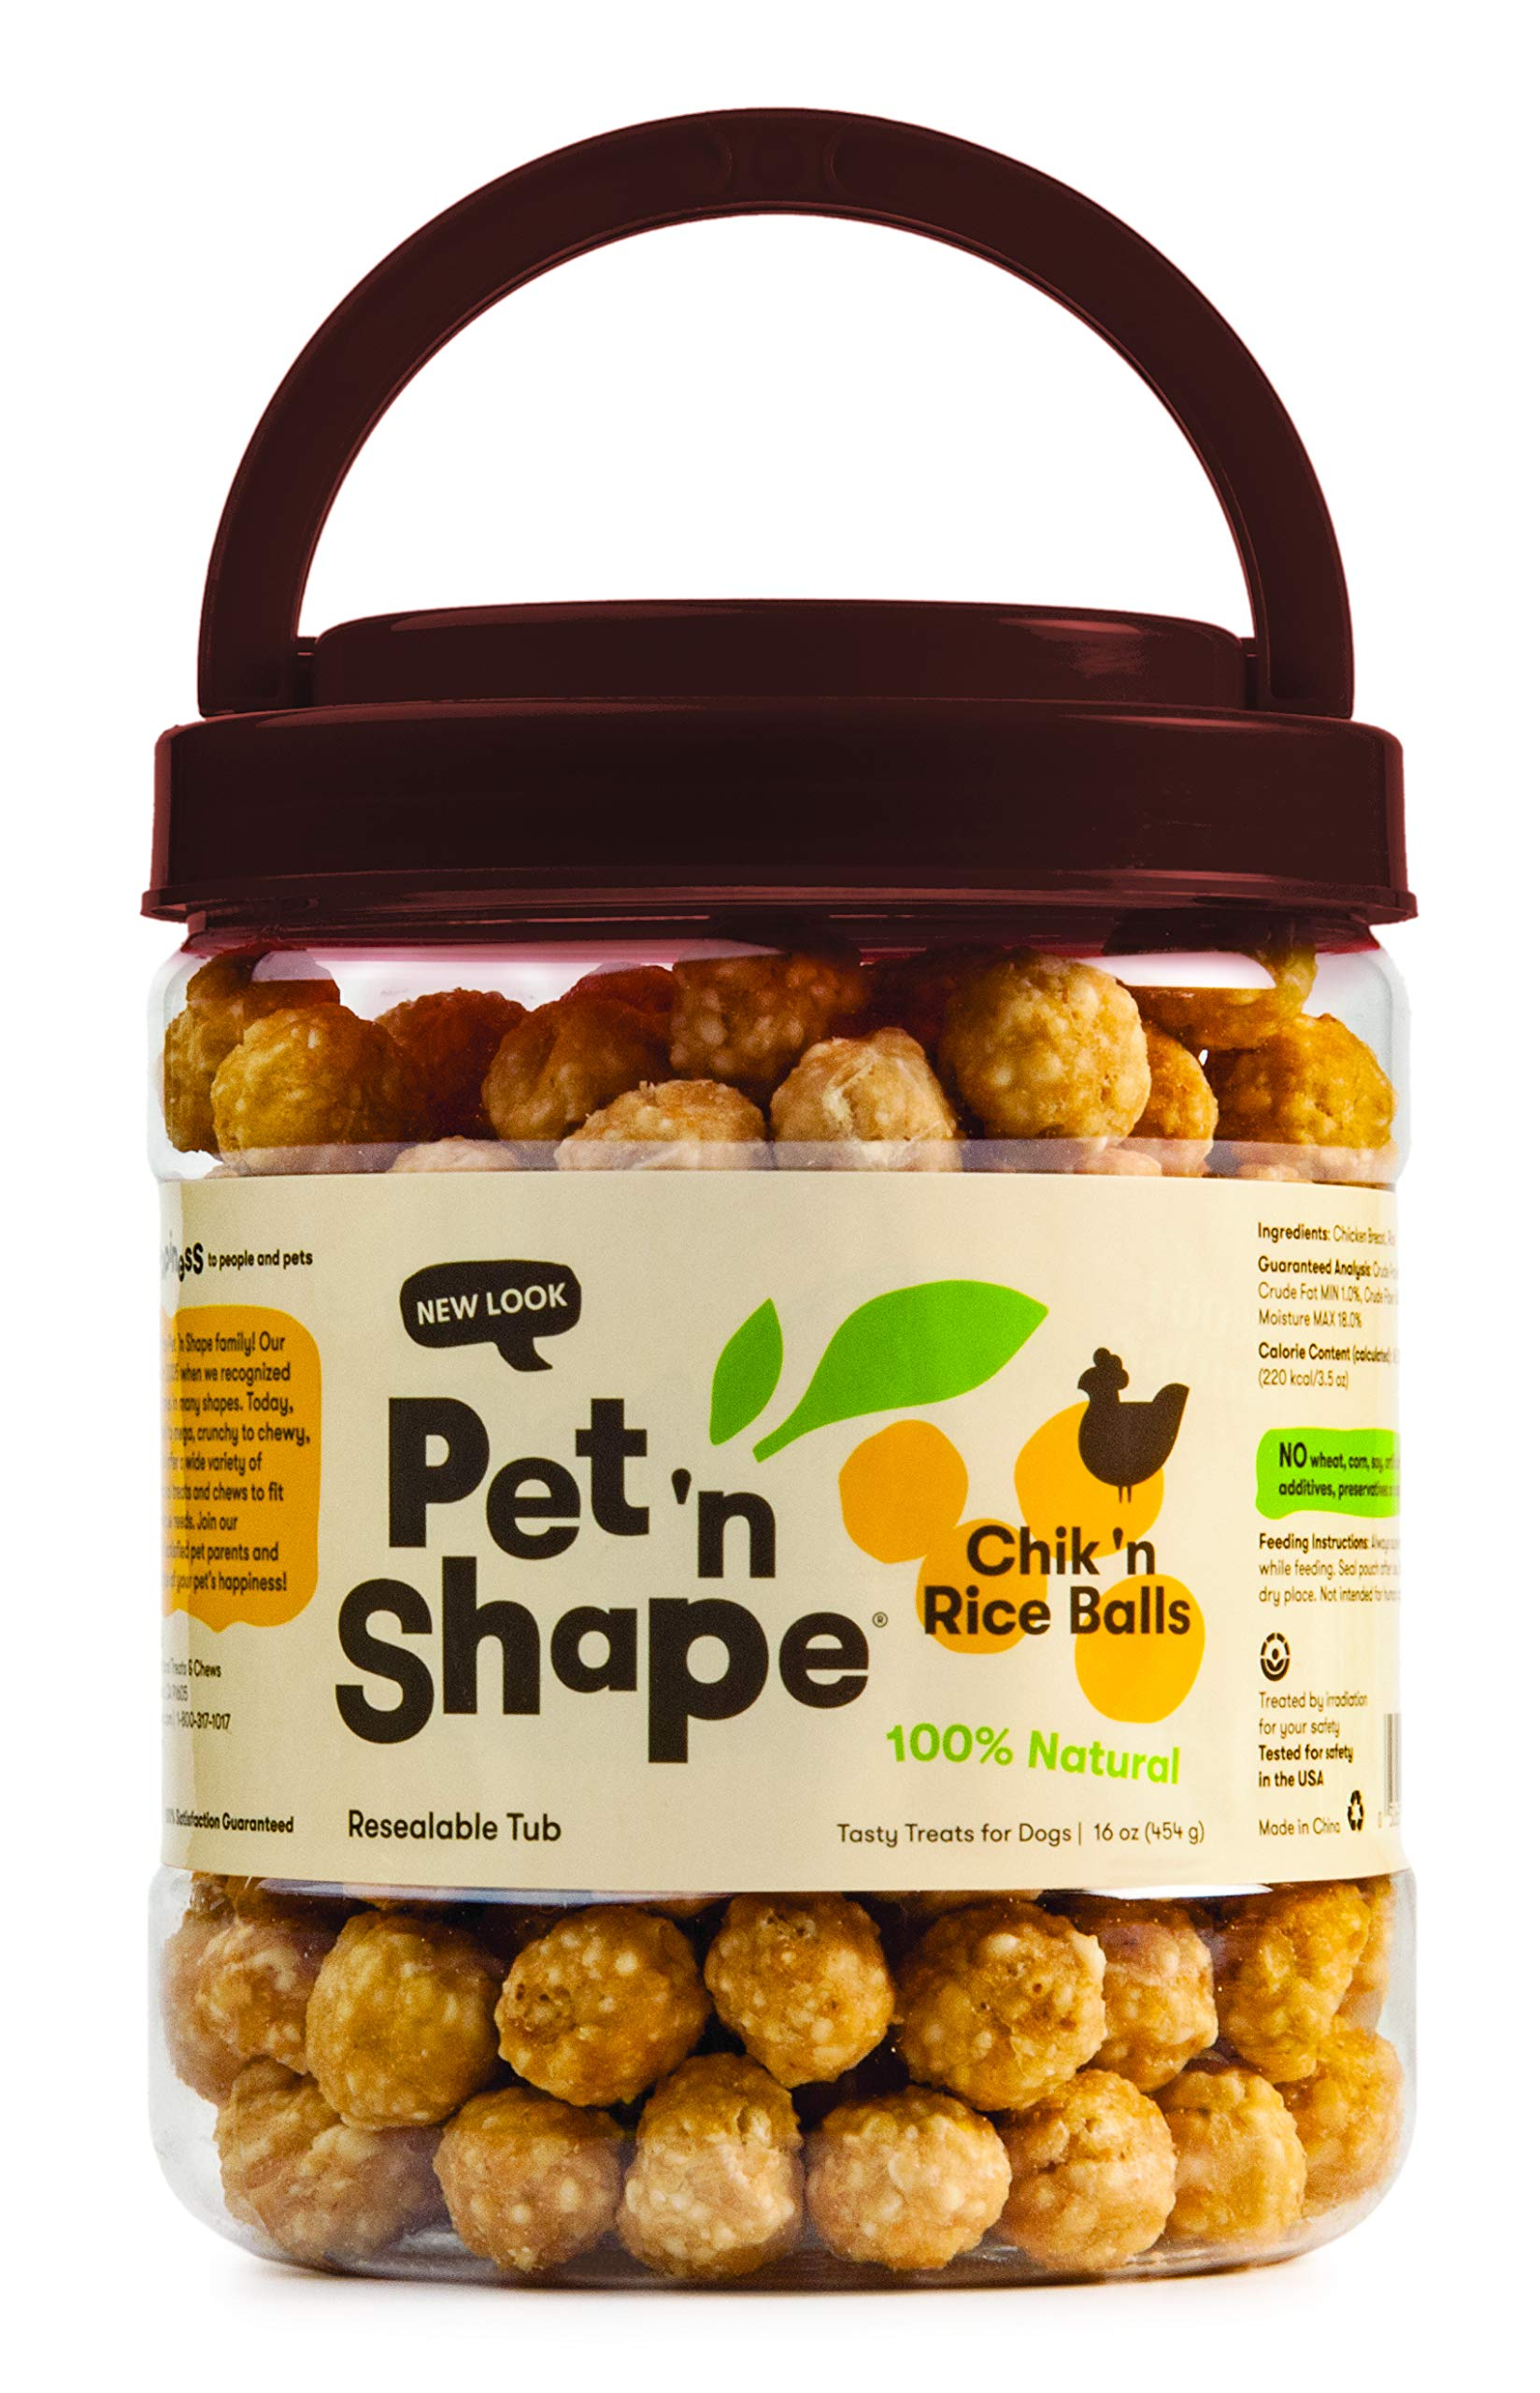 Pet 'n Shape Chik 'n Rice Balls Natural Dog Treats, 1-Pound